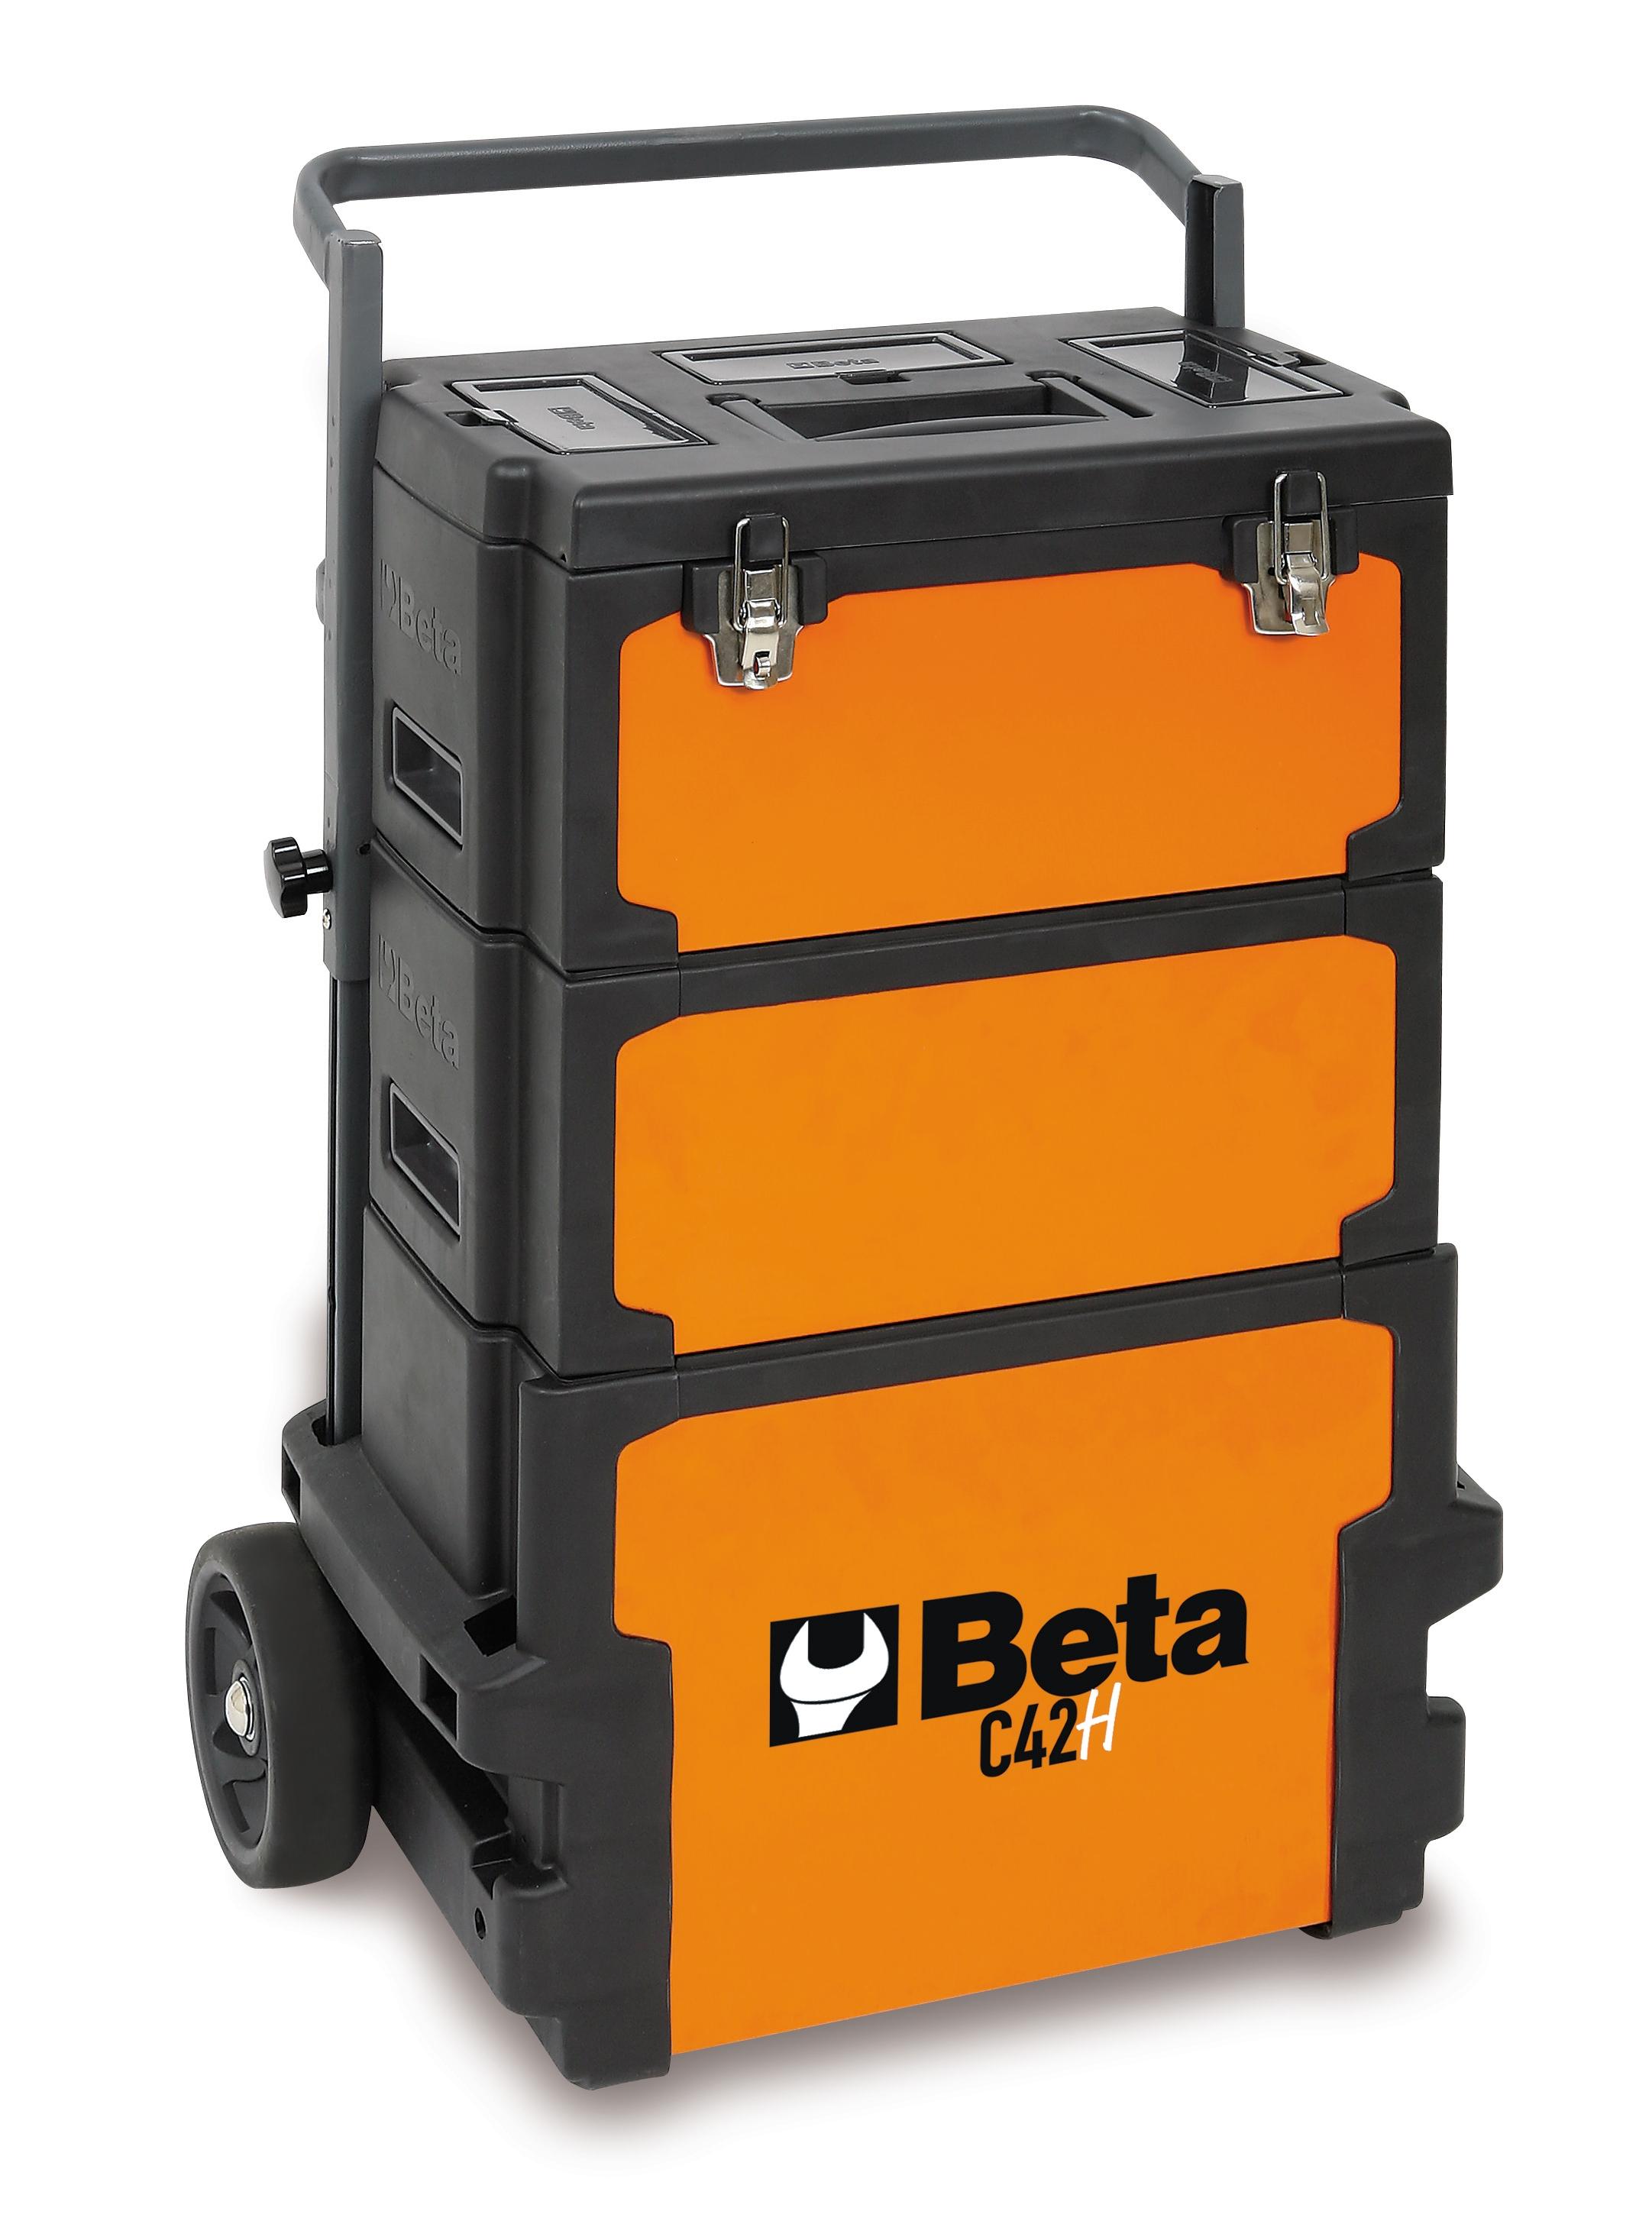 Trolley C42H - 4200H - BETA Utensili